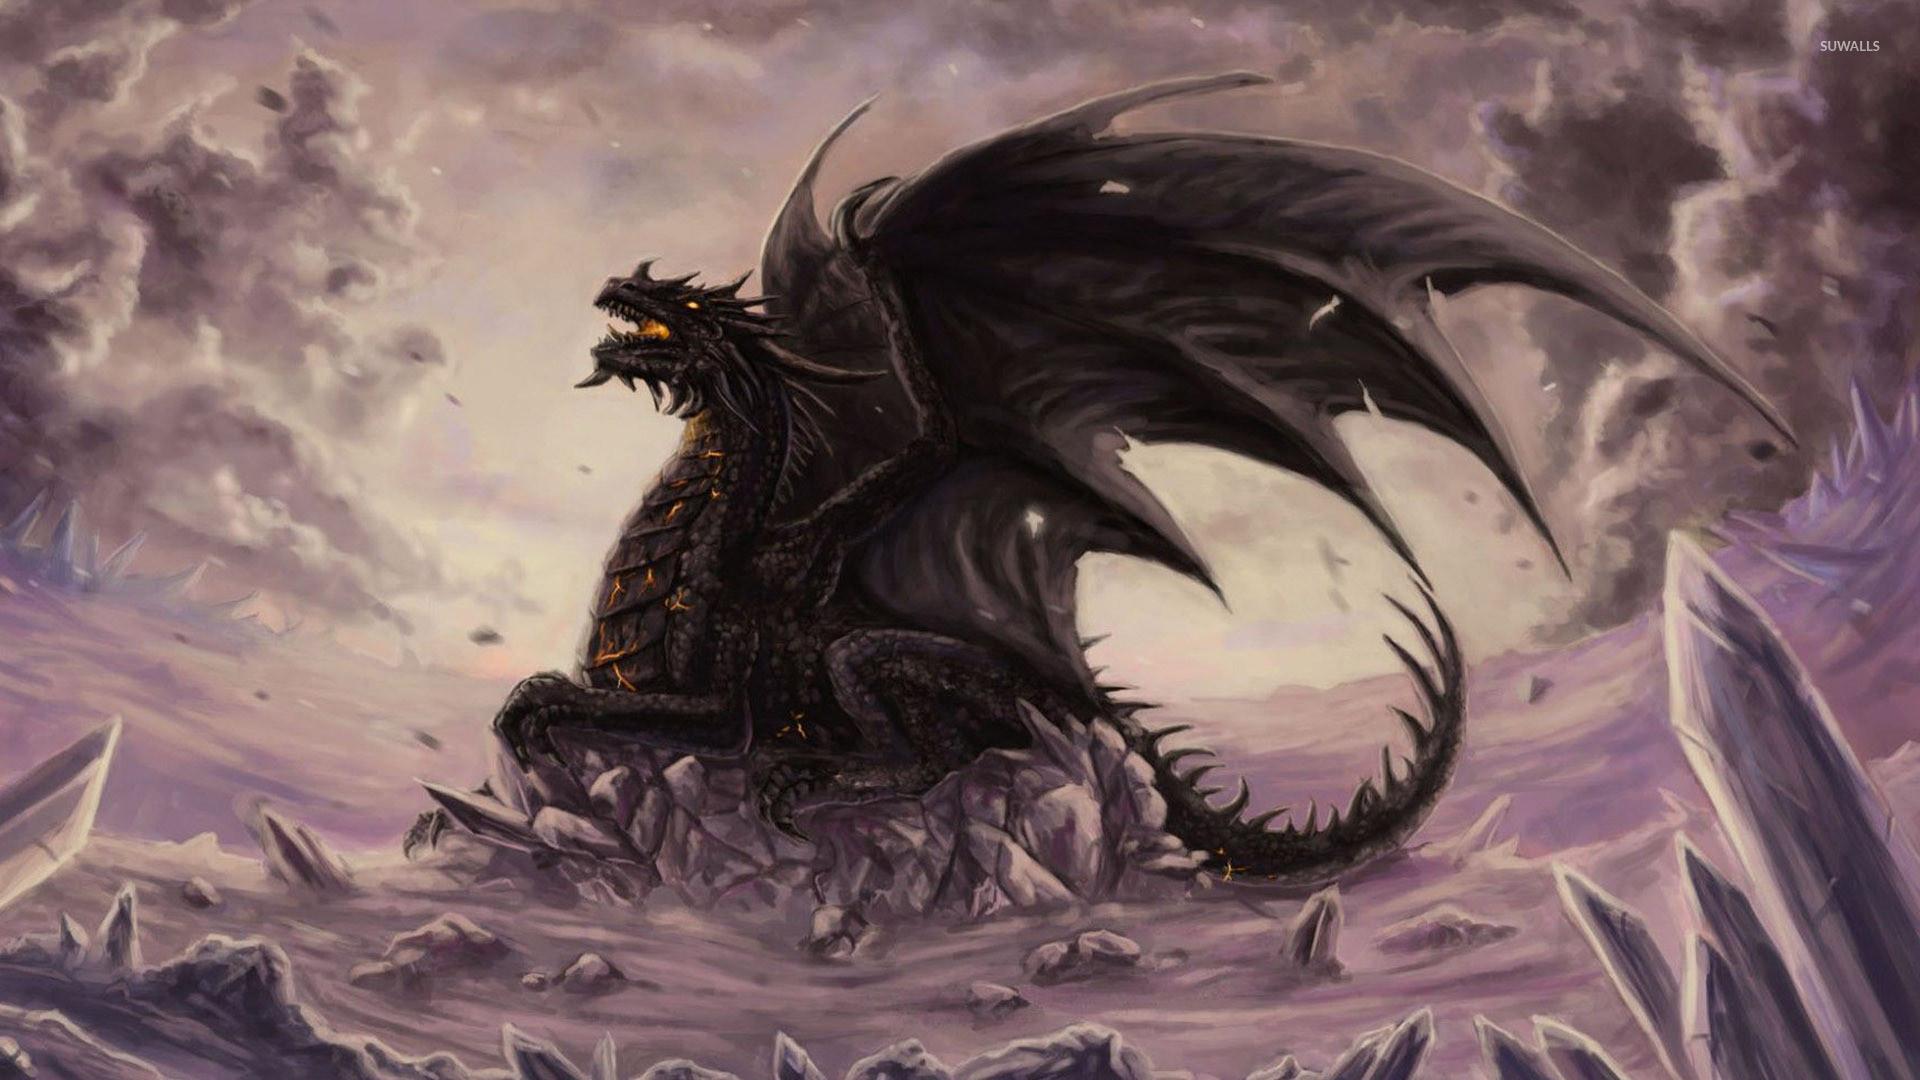 Dragon on the cliff wallpaper jpg